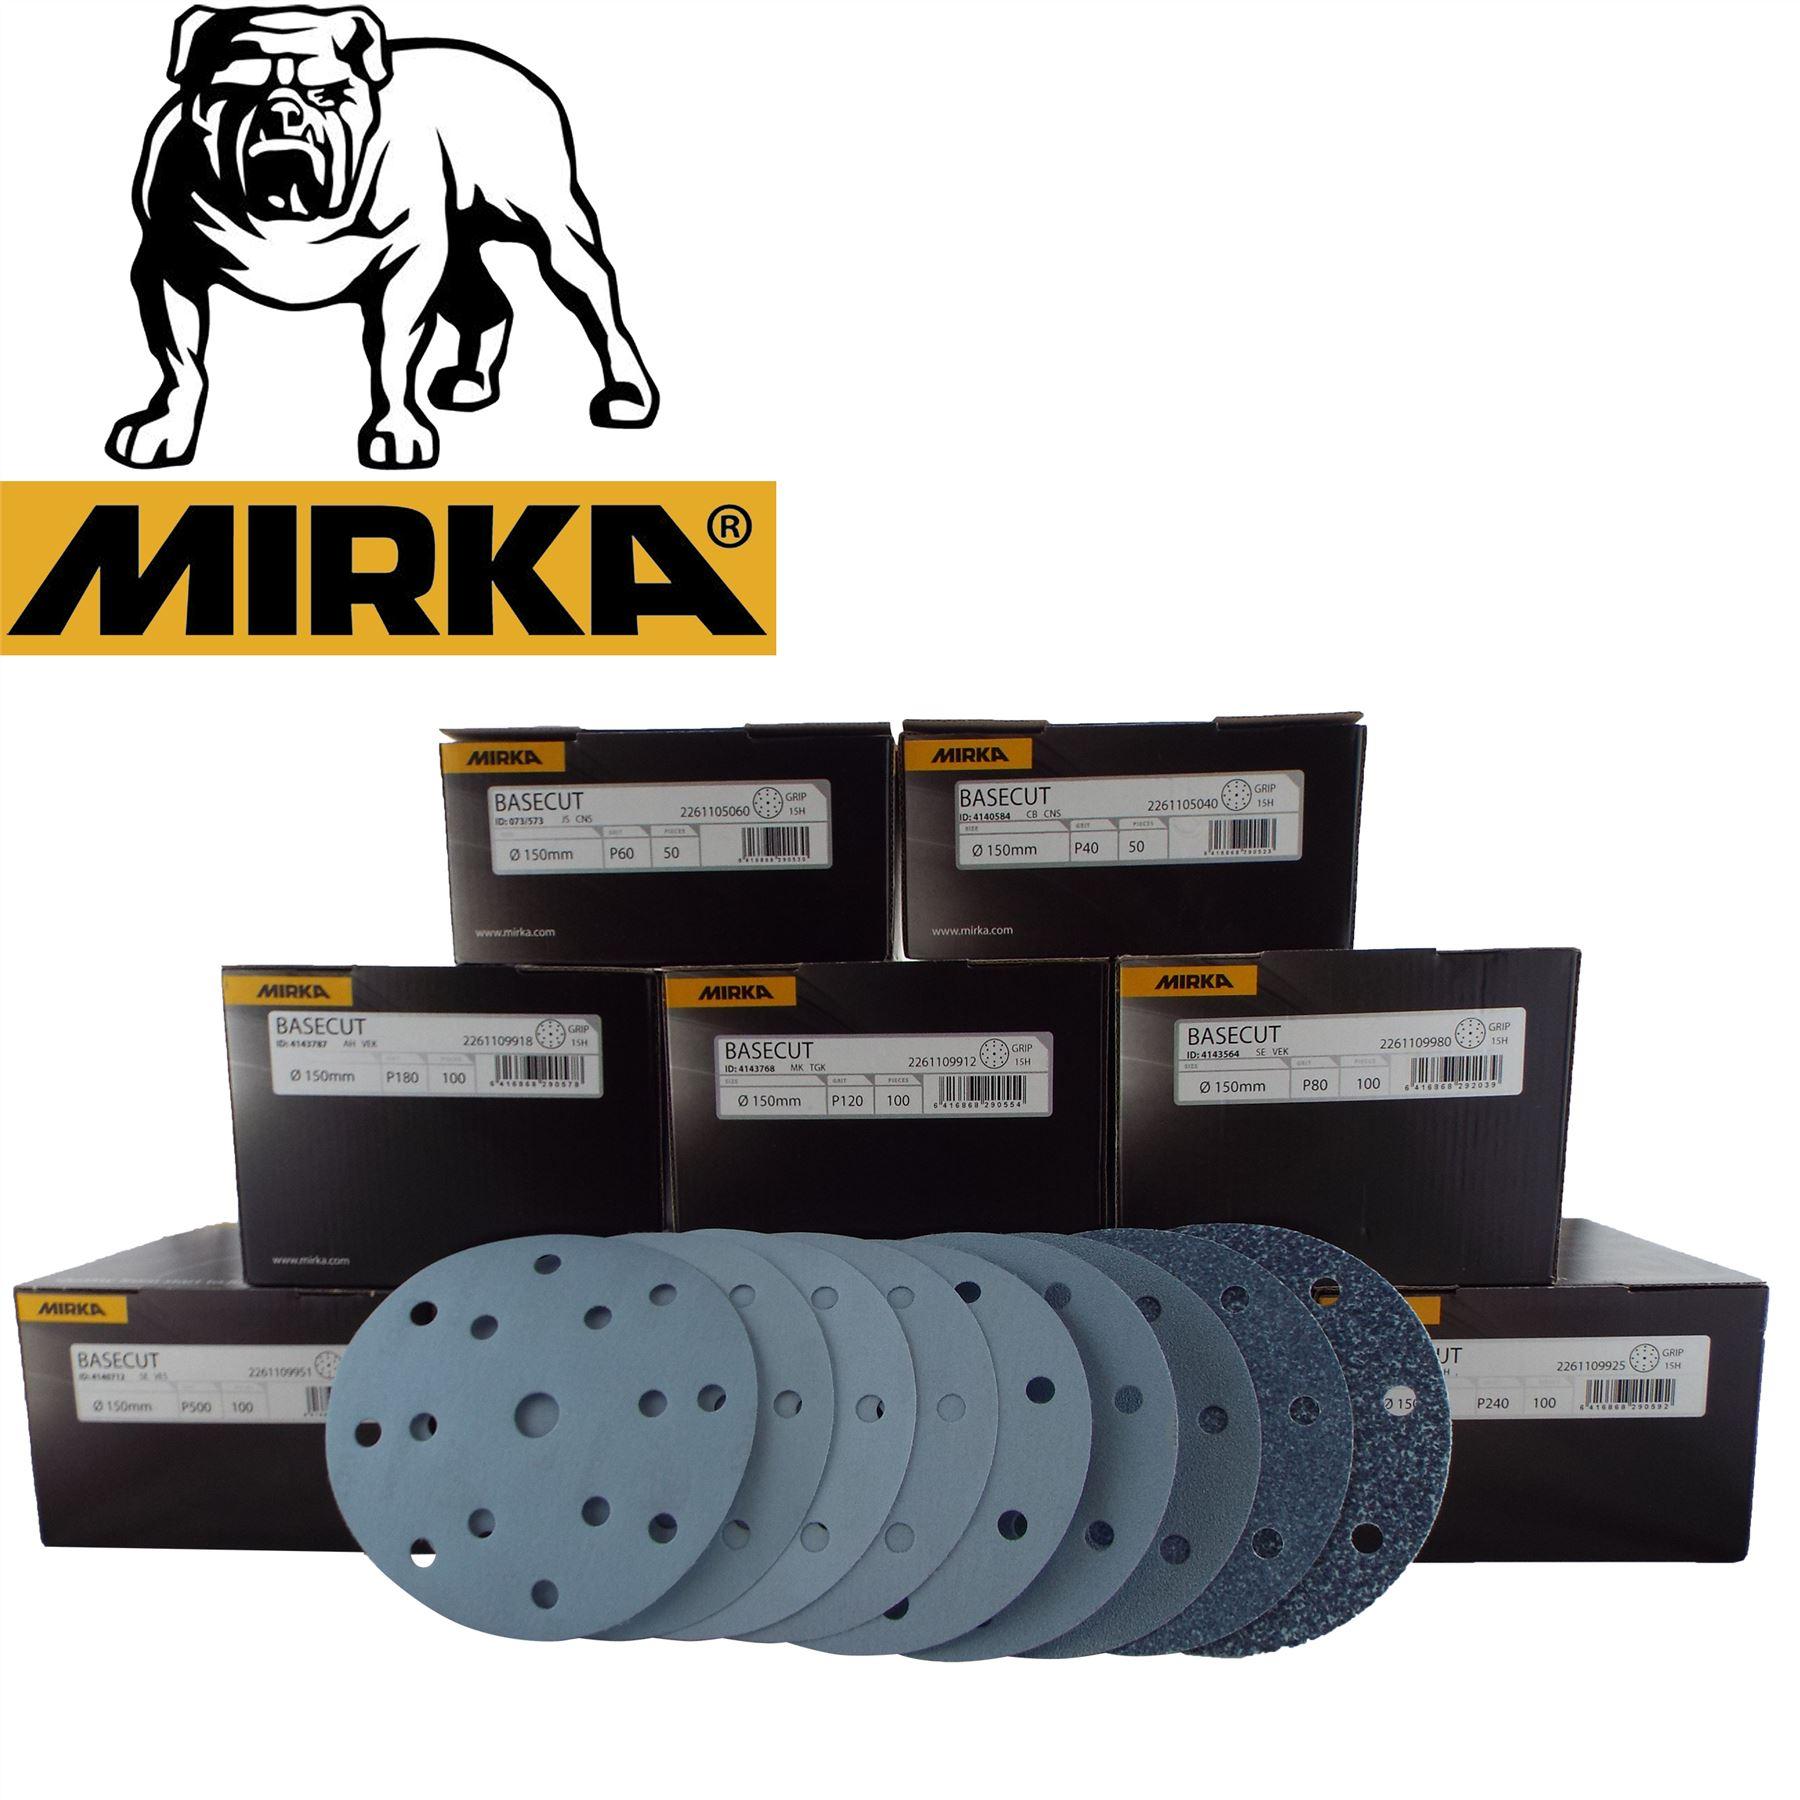 "Mirka 22-612-180 BaseCut 5/"" Hook And Loop Grip Discs 180G 50//Box"